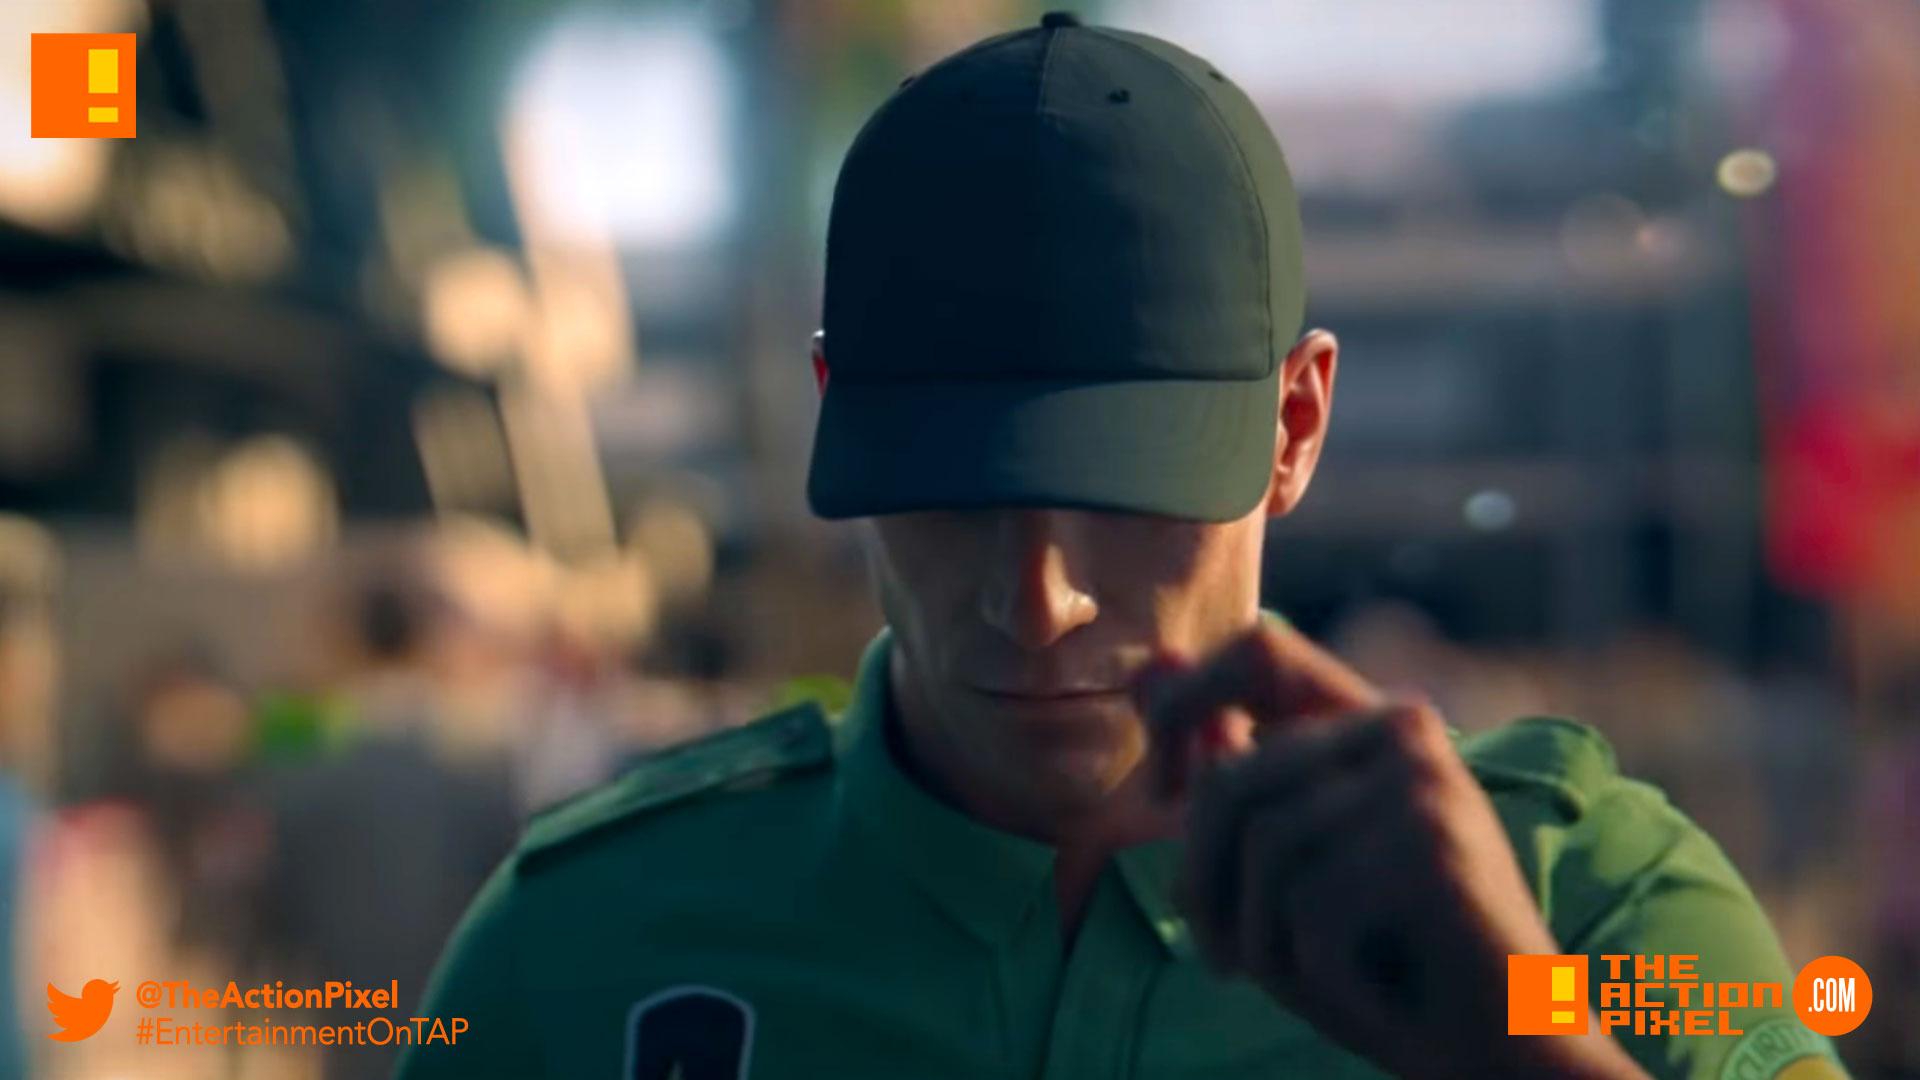 hitman 2, hitman, wb games, announce trailer, trailer, entertainment on tap, the action pixel